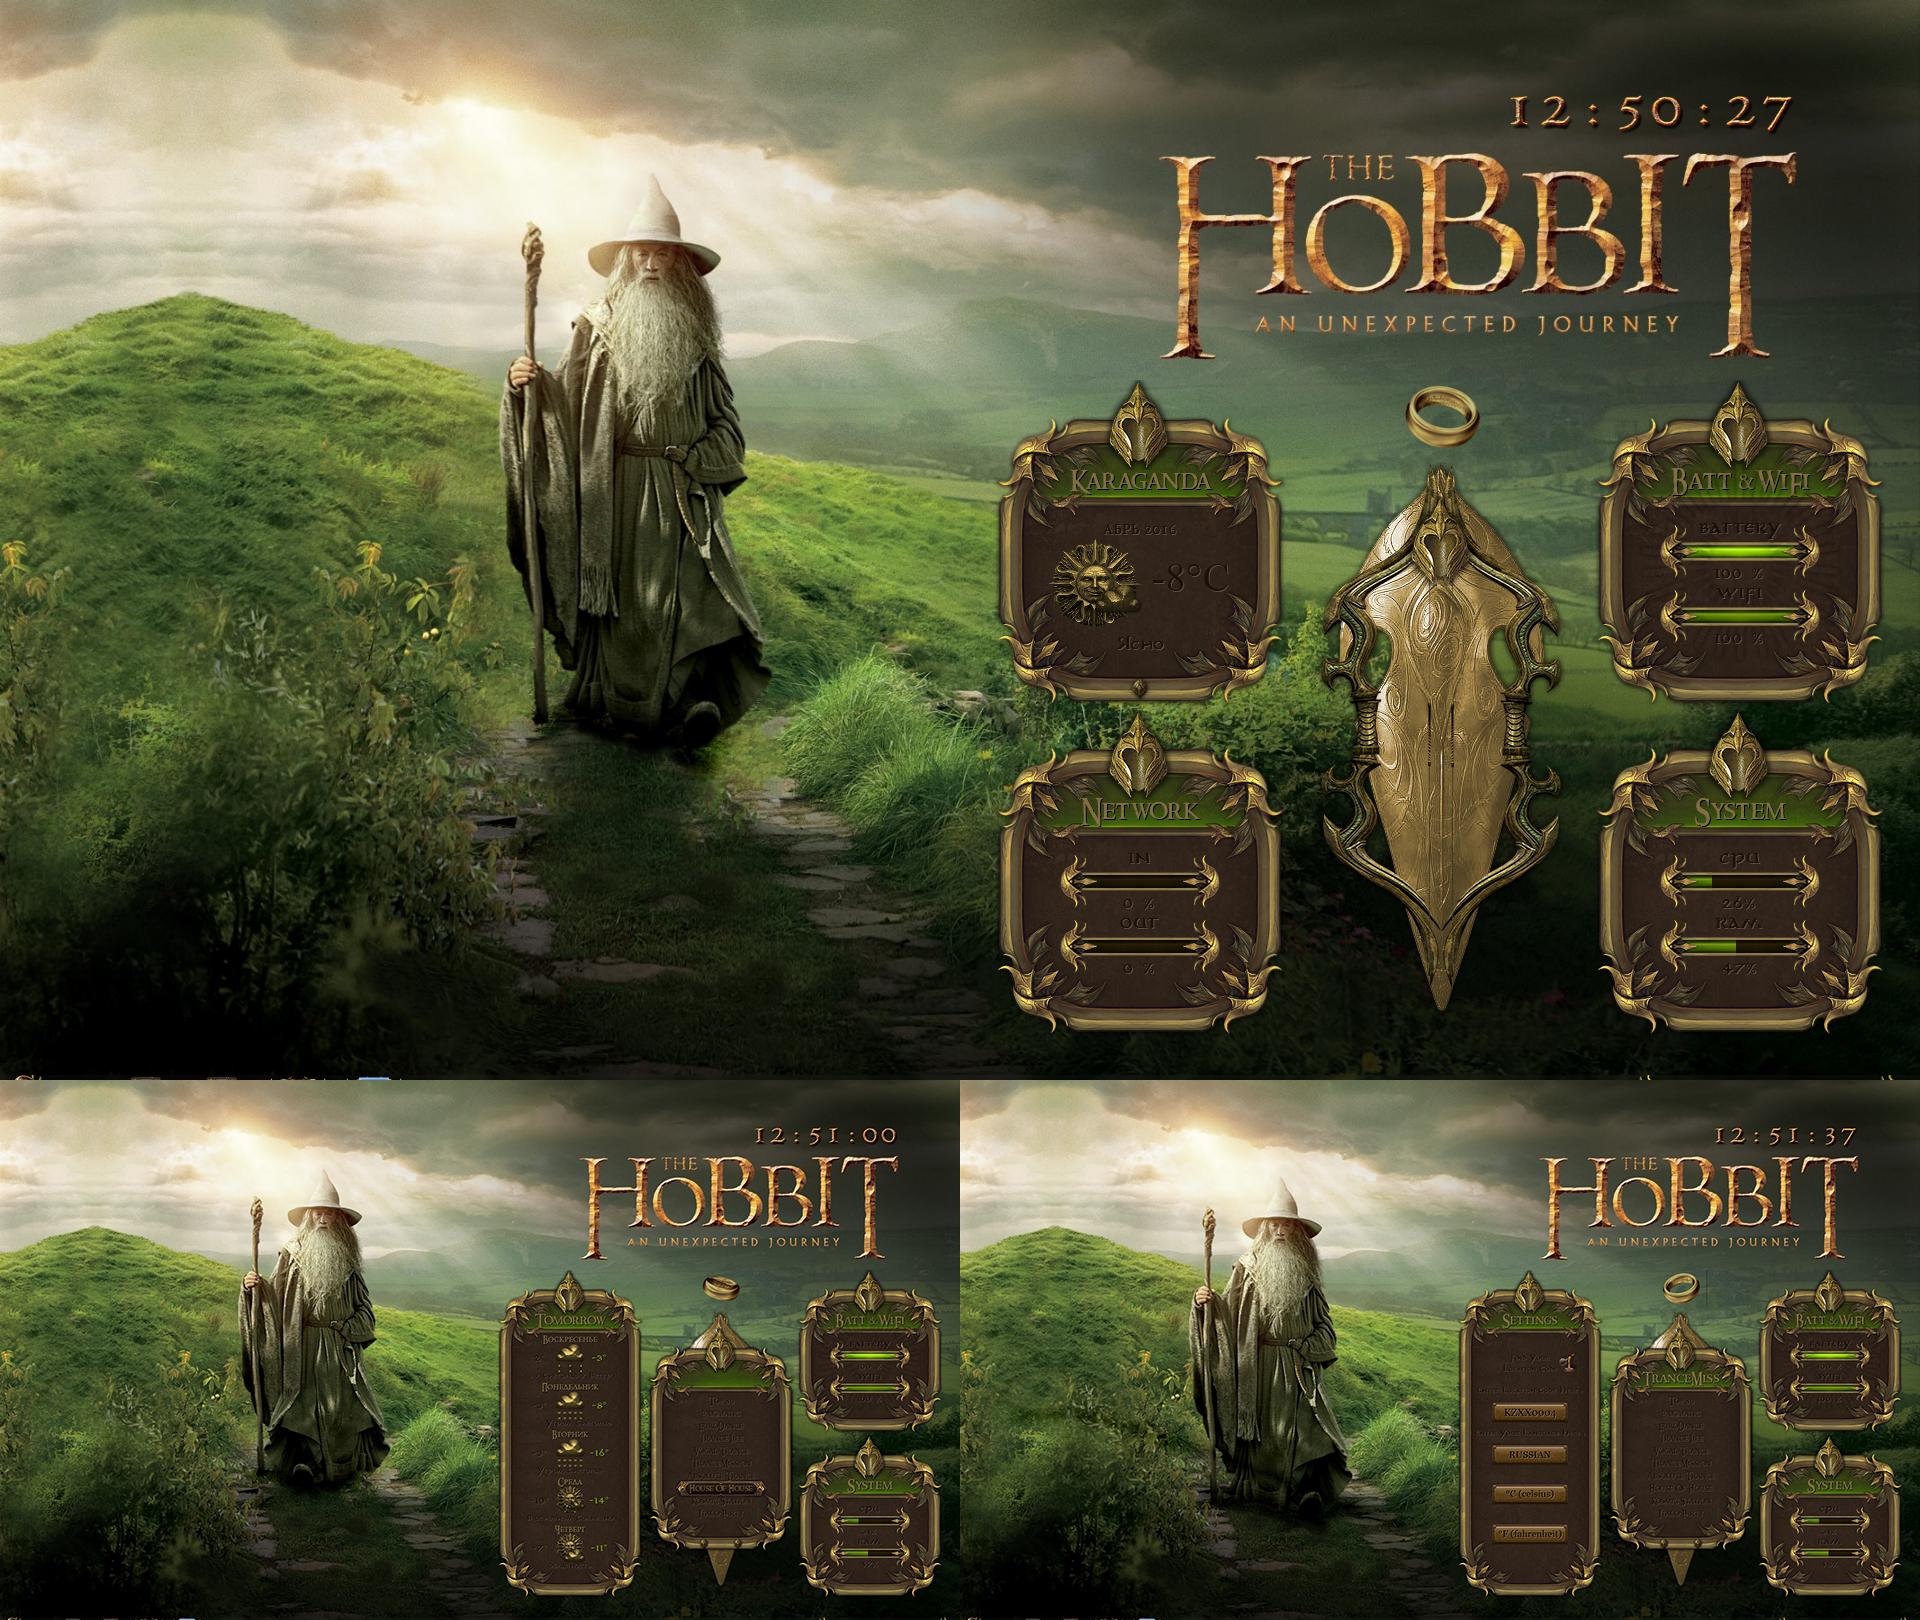 Hobbit gmail theme - Hobbit Full Hd Theme For Rainmeter By Orthodoxx67